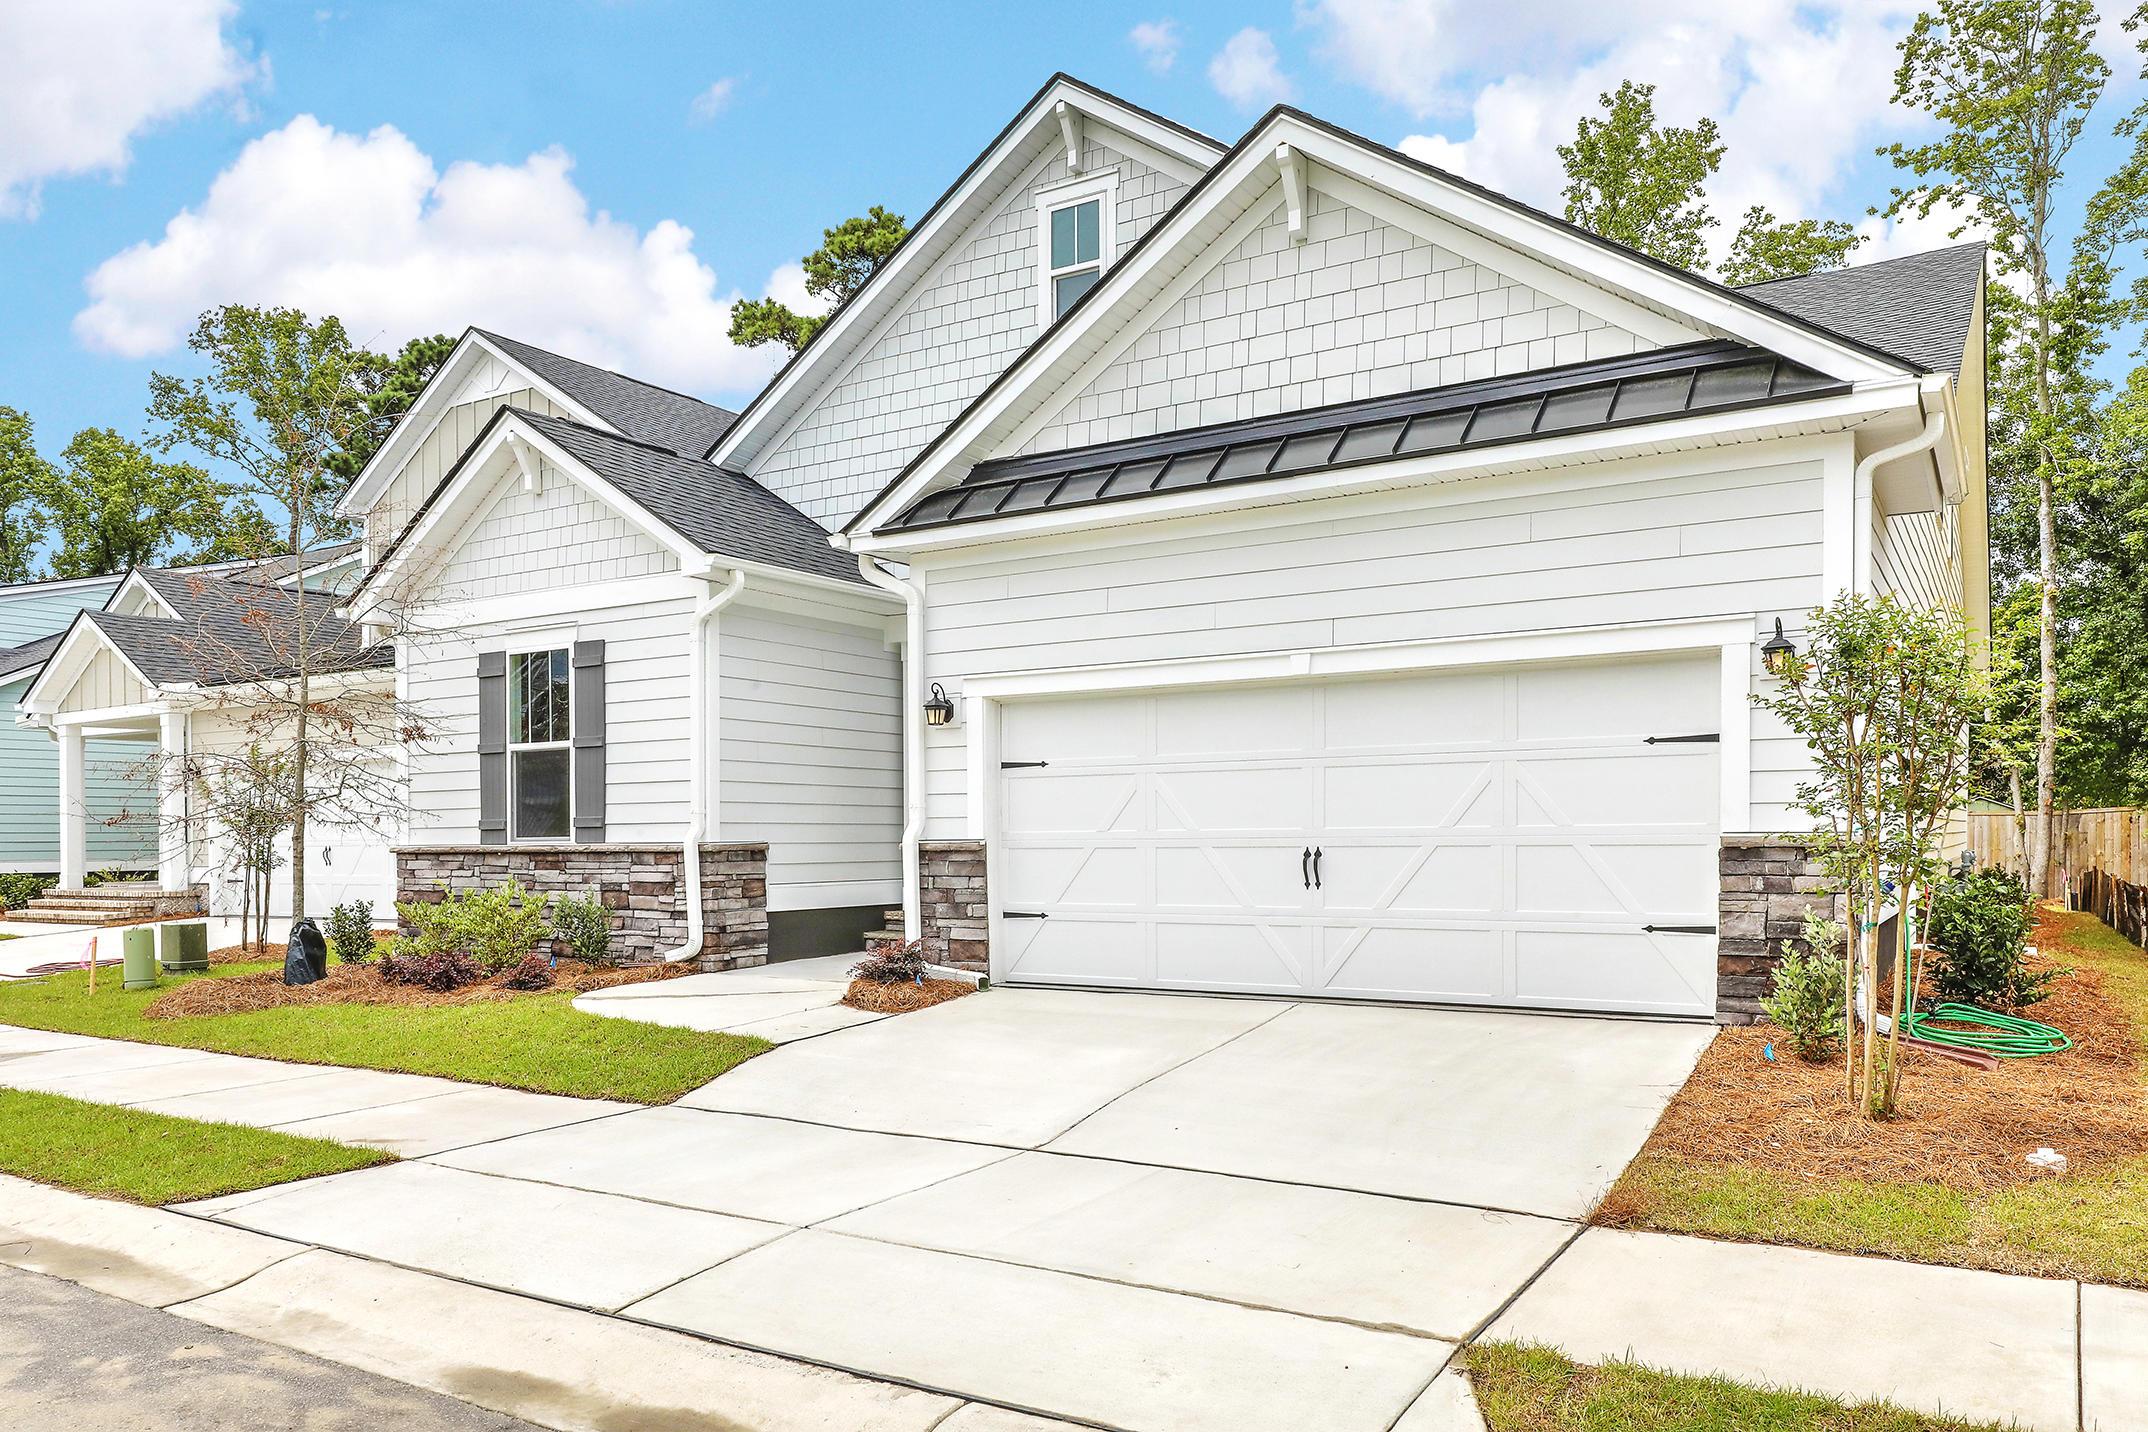 Bentley Park Homes For Sale - 1277 Gannett, Mount Pleasant, SC - 31